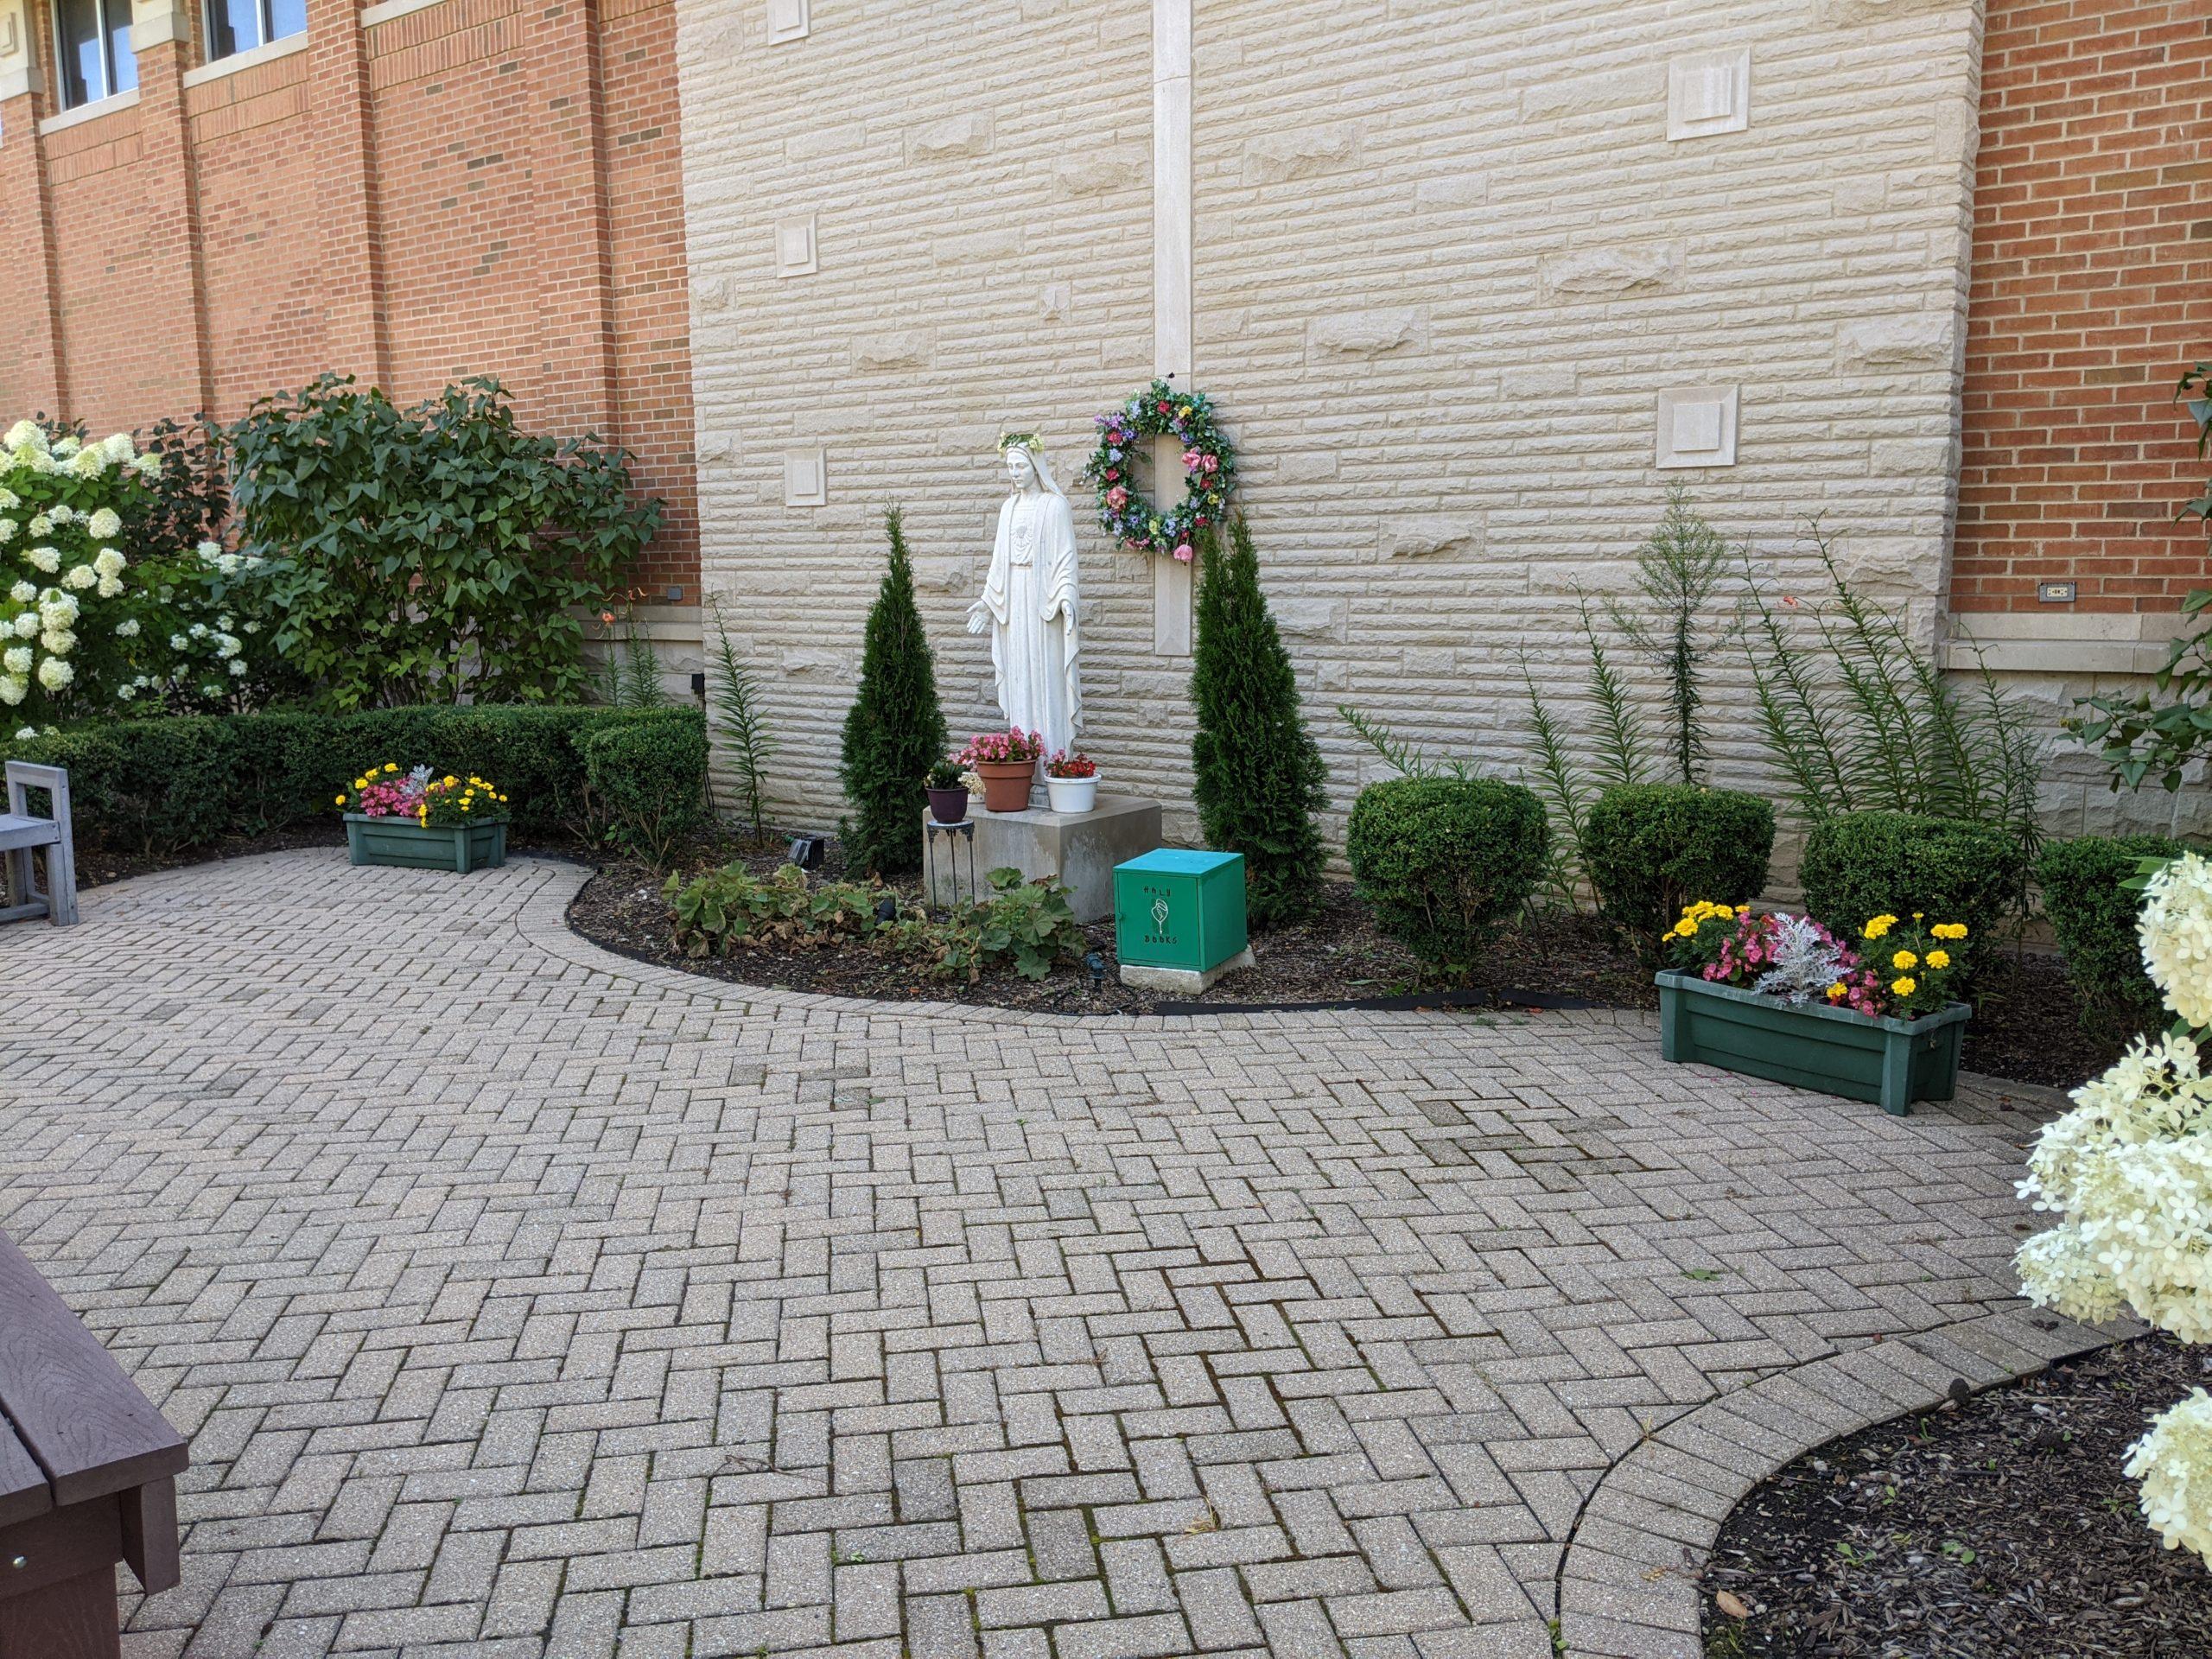 St Raymond Parish, Mt Prospect IL